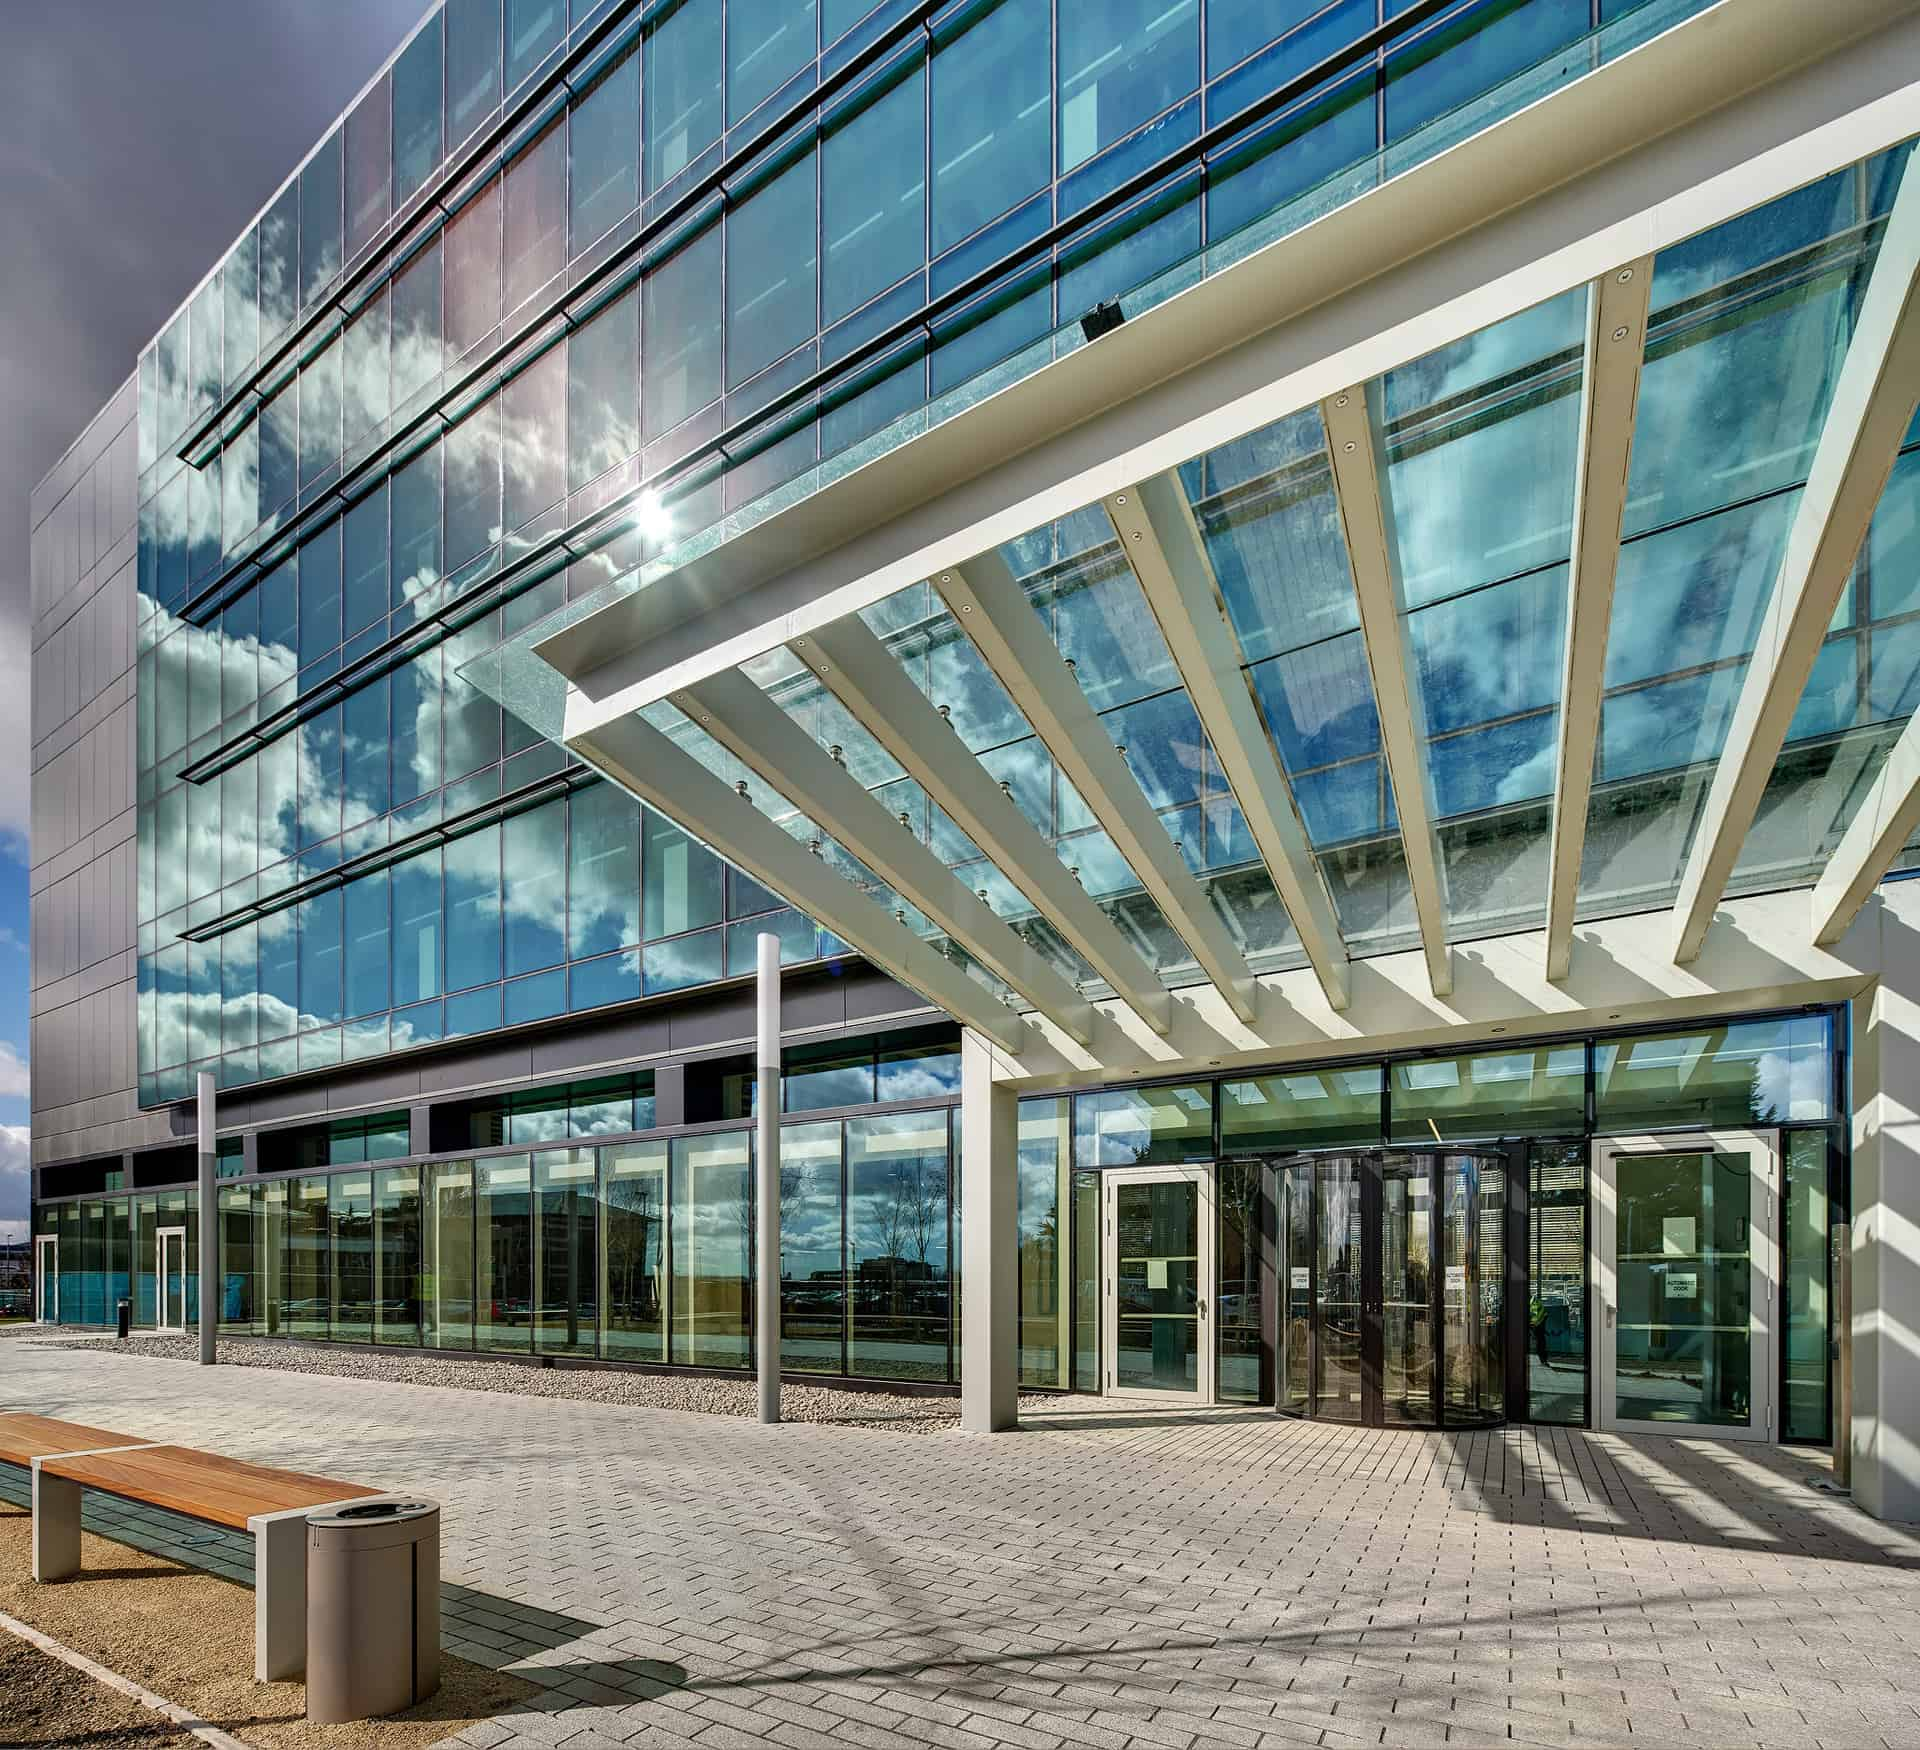 DAA-Building-2015-03-31-_DSC9655a-flat